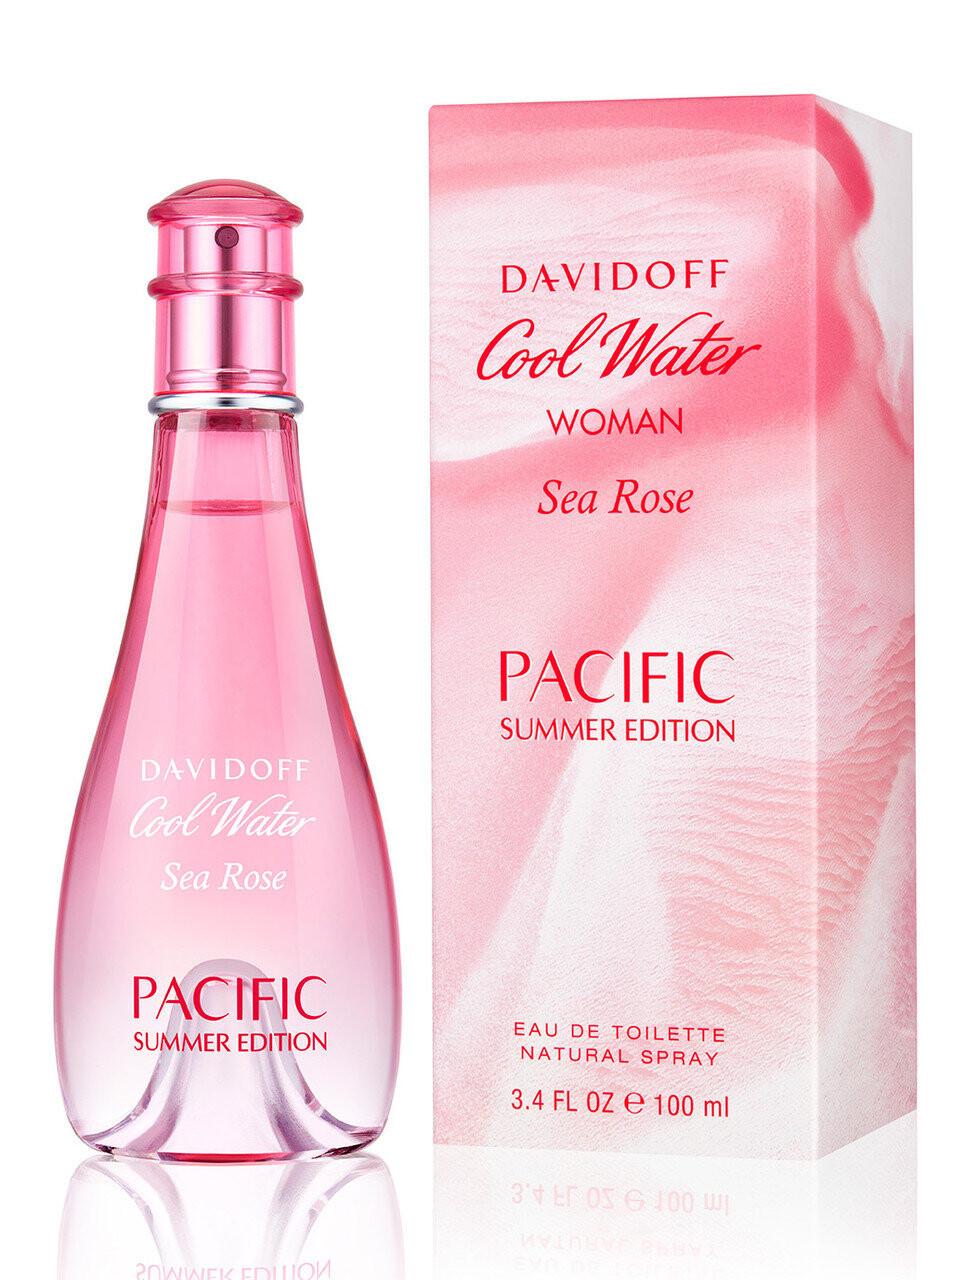 Davidoff Cool Water Sea Rose Pacific Summer Edition